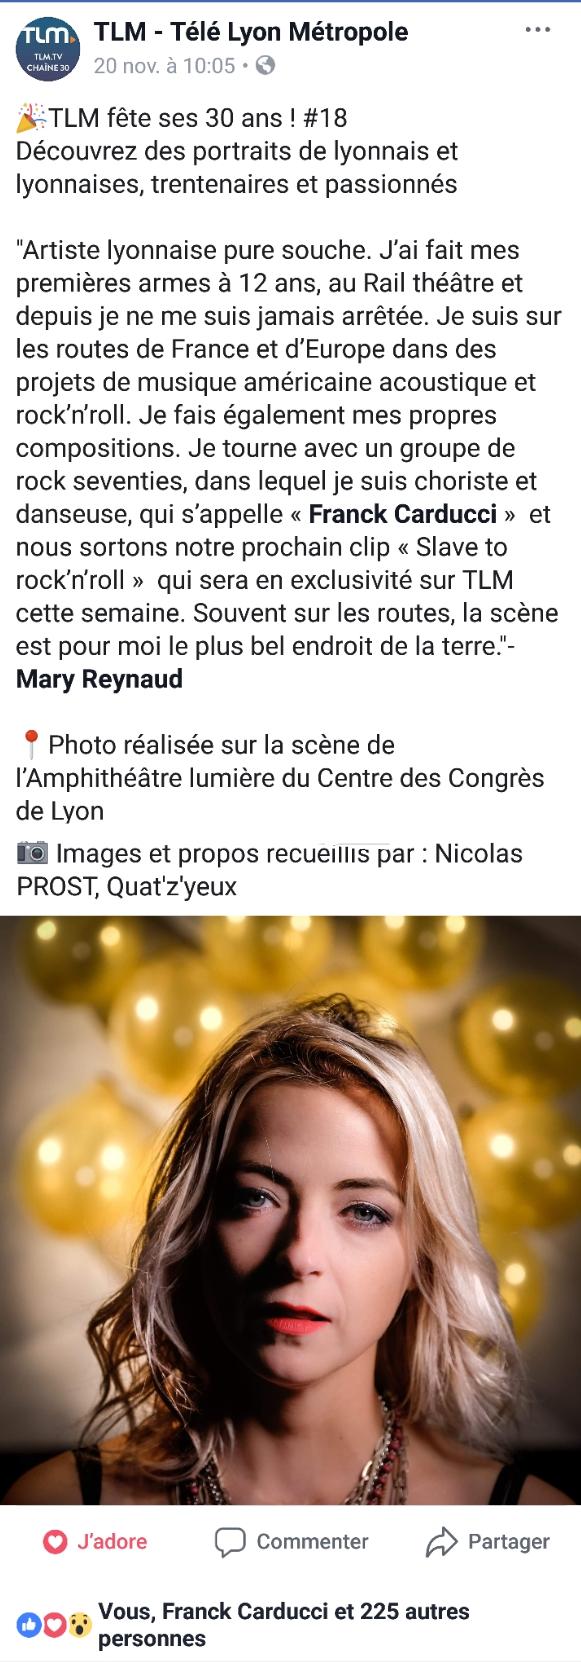 TLM  - Les trentenaires lyonnais